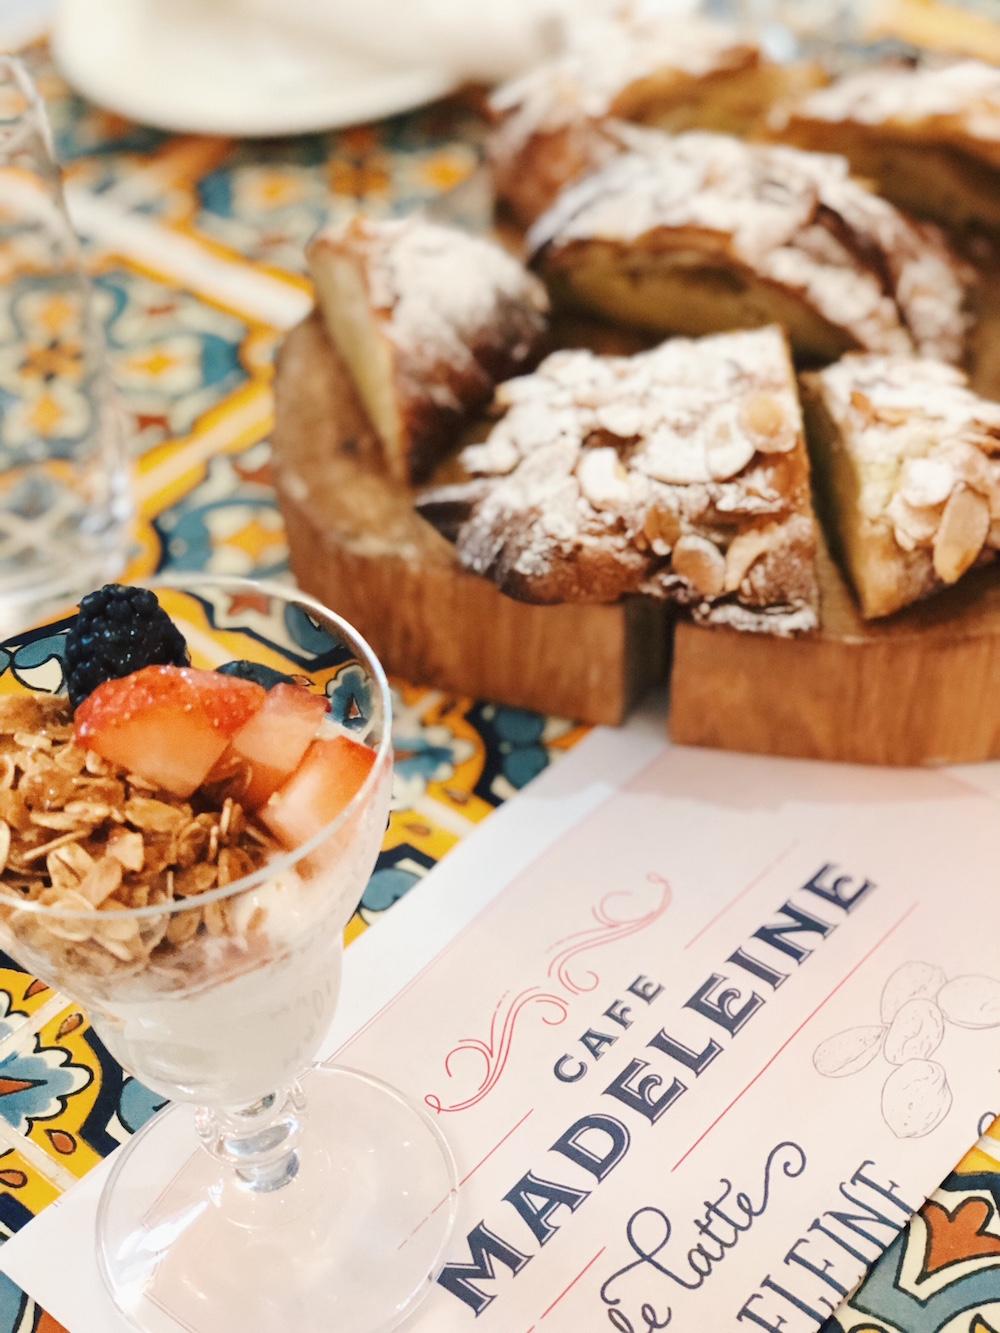 Yogurt parfait and pastries on wood cutting board at Grand Hyatt Baha Mar Bahamas